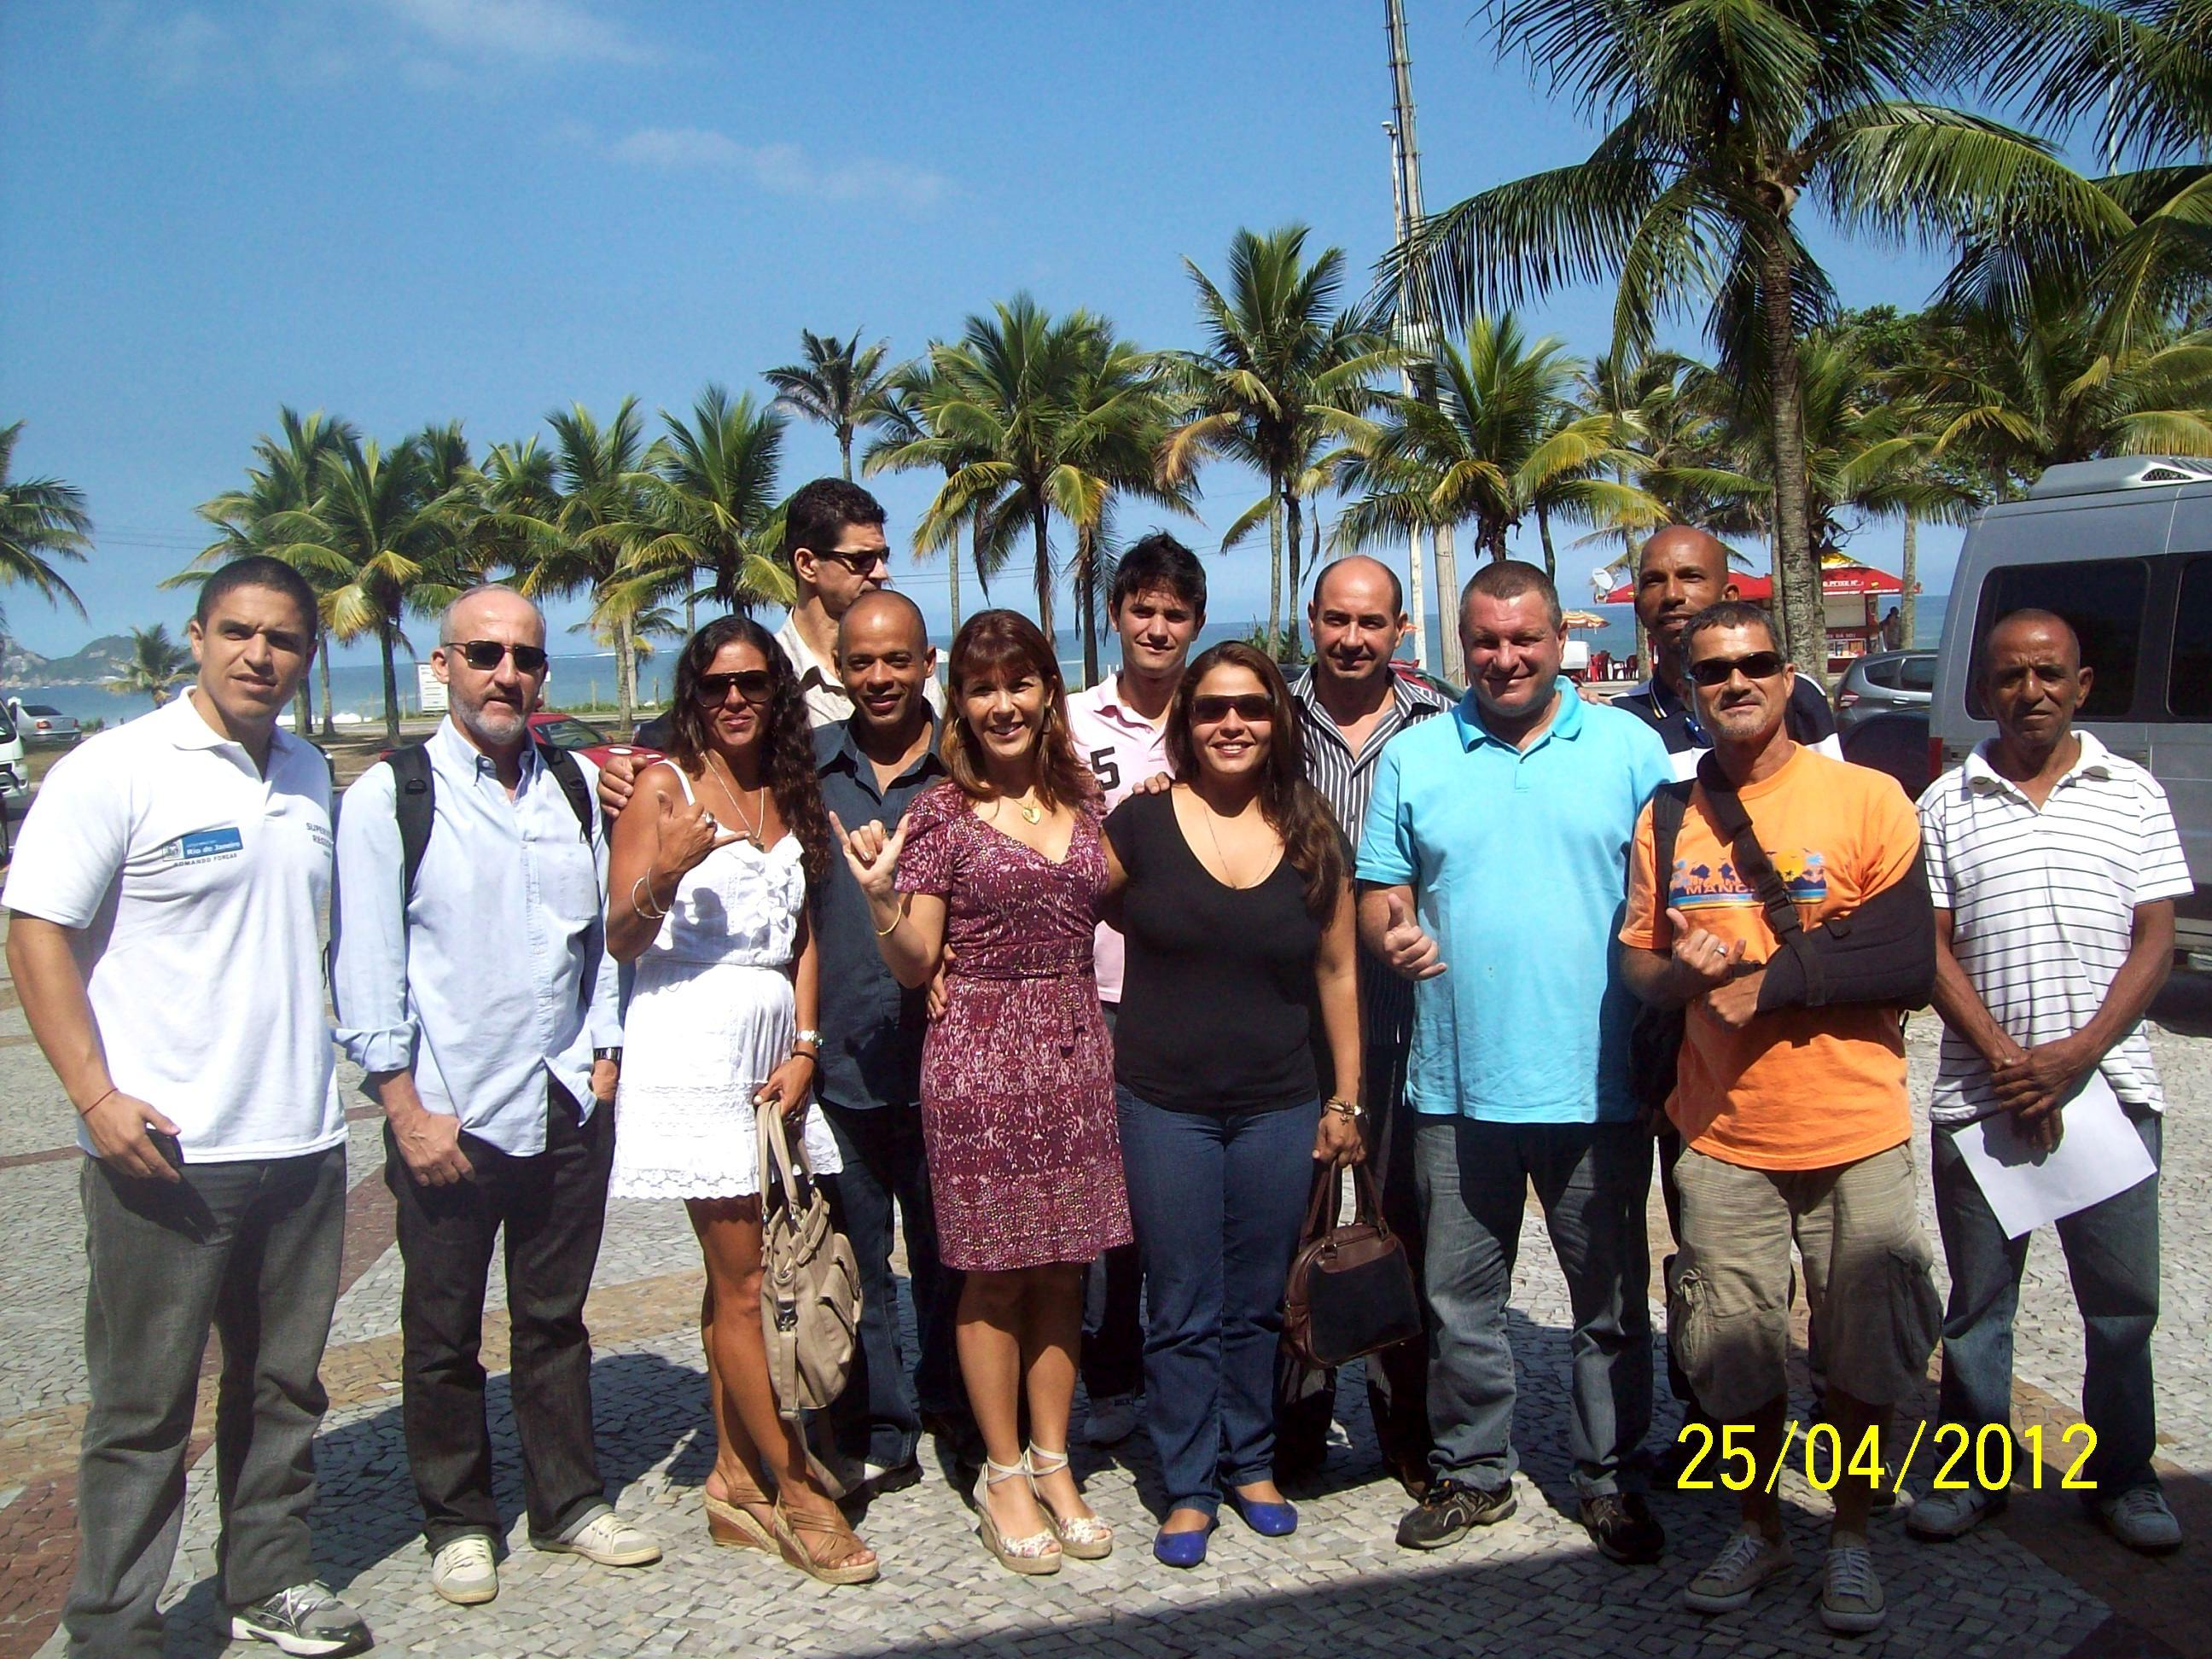 GT Praias Barra Sustentável